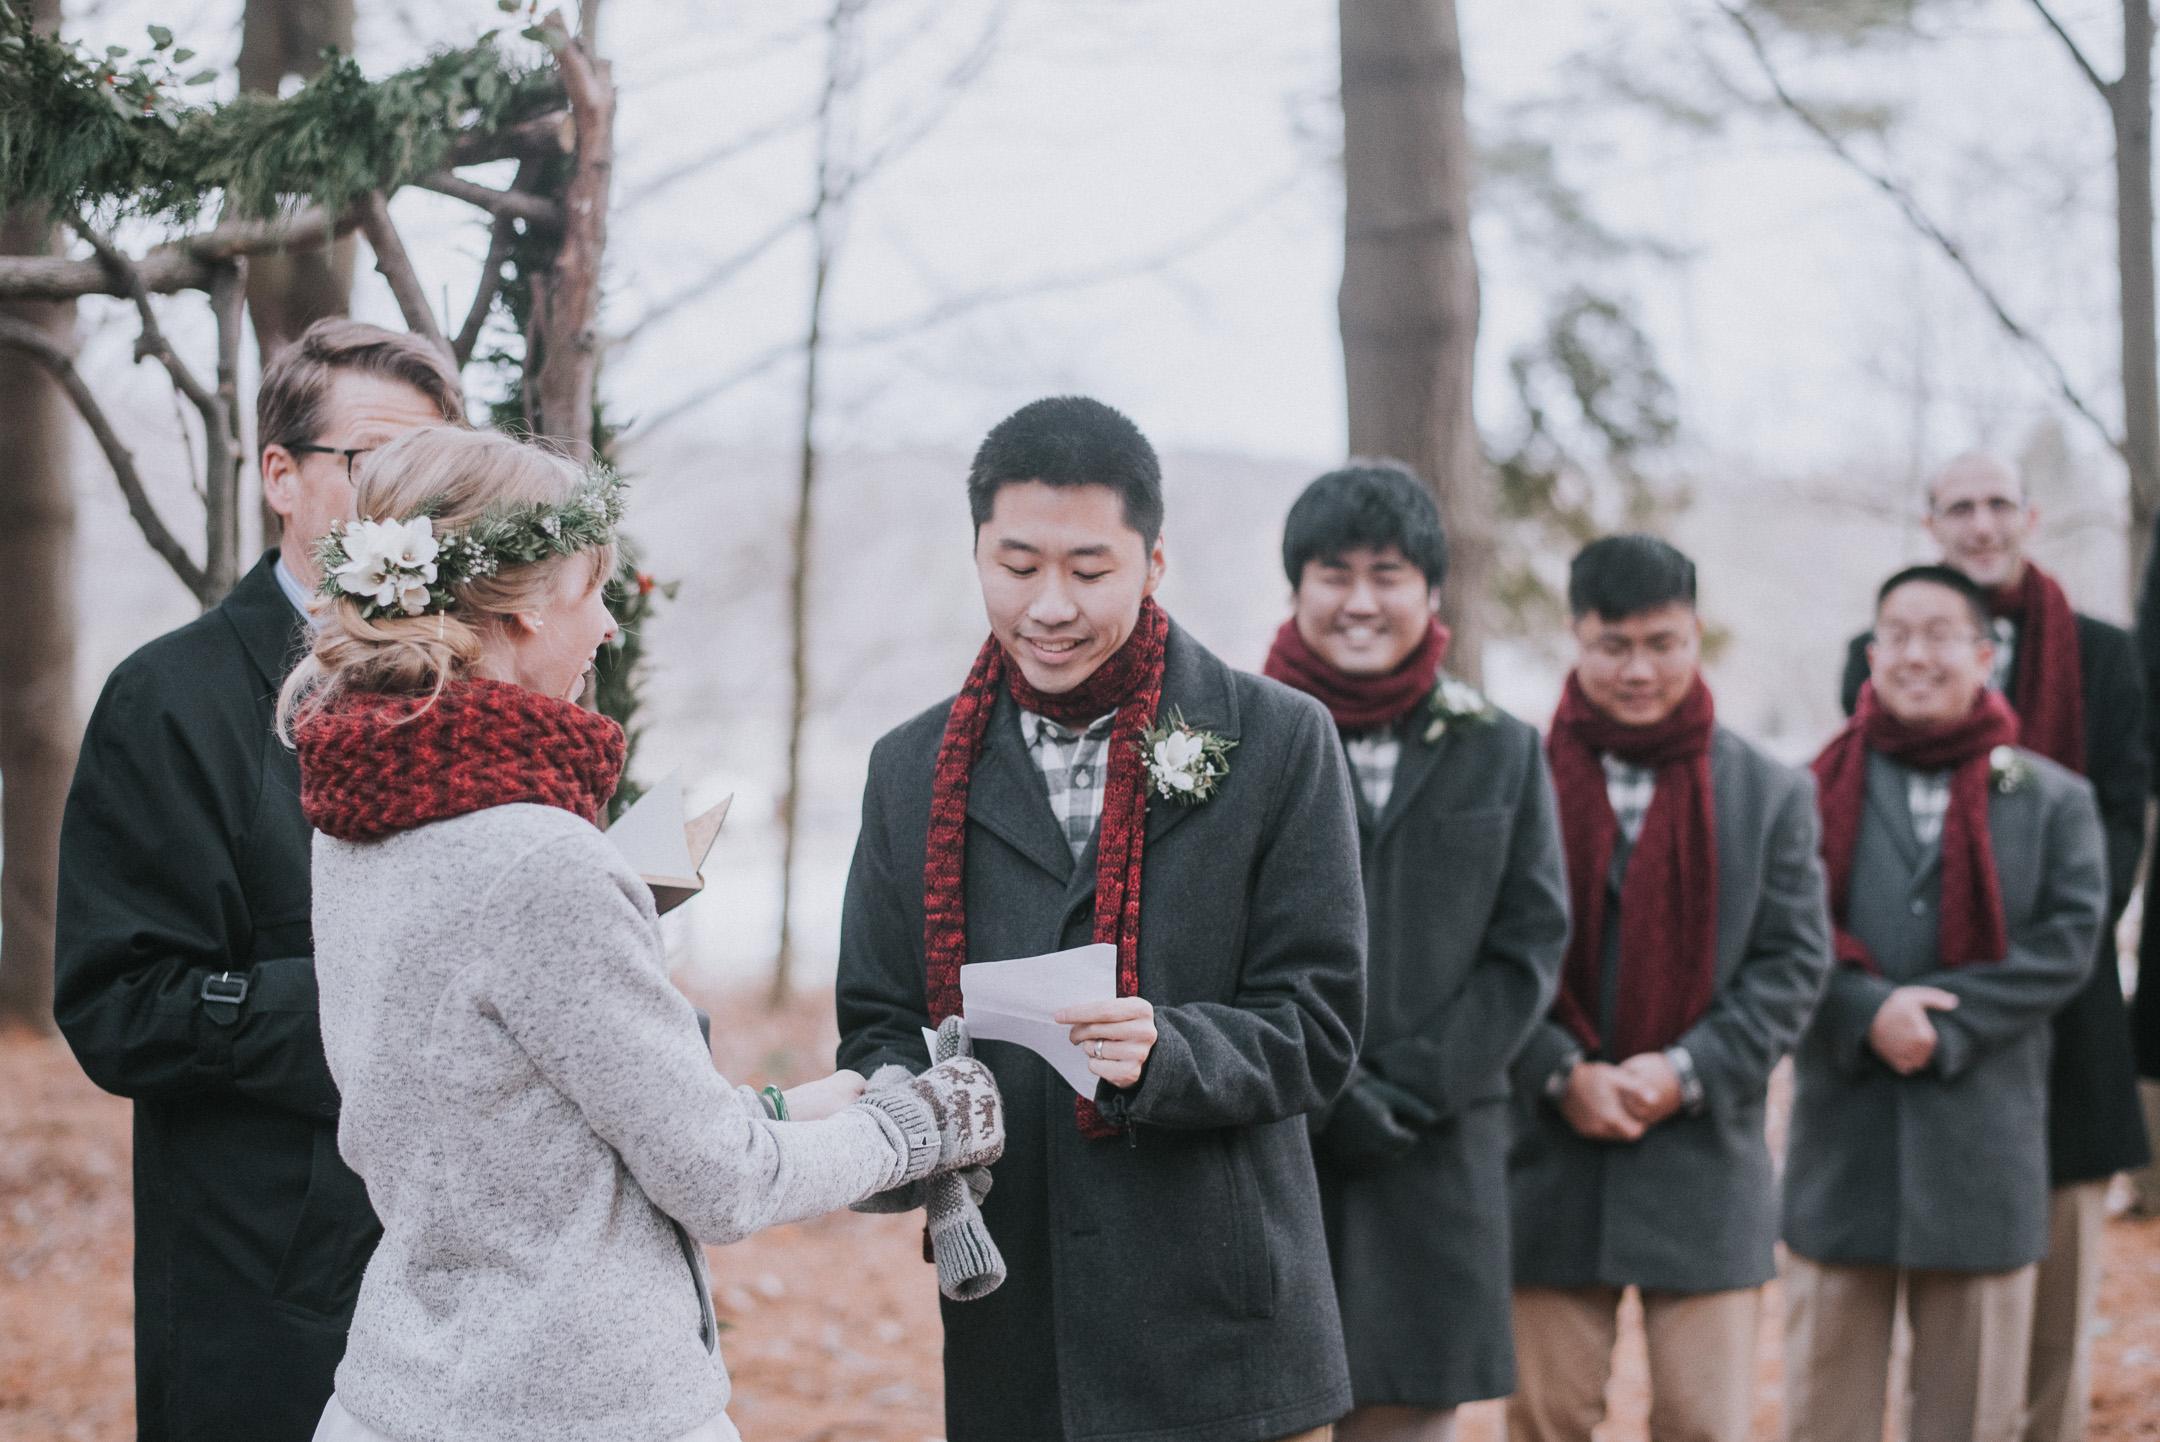 thurmont wedding photographer (22 of 38).jpg